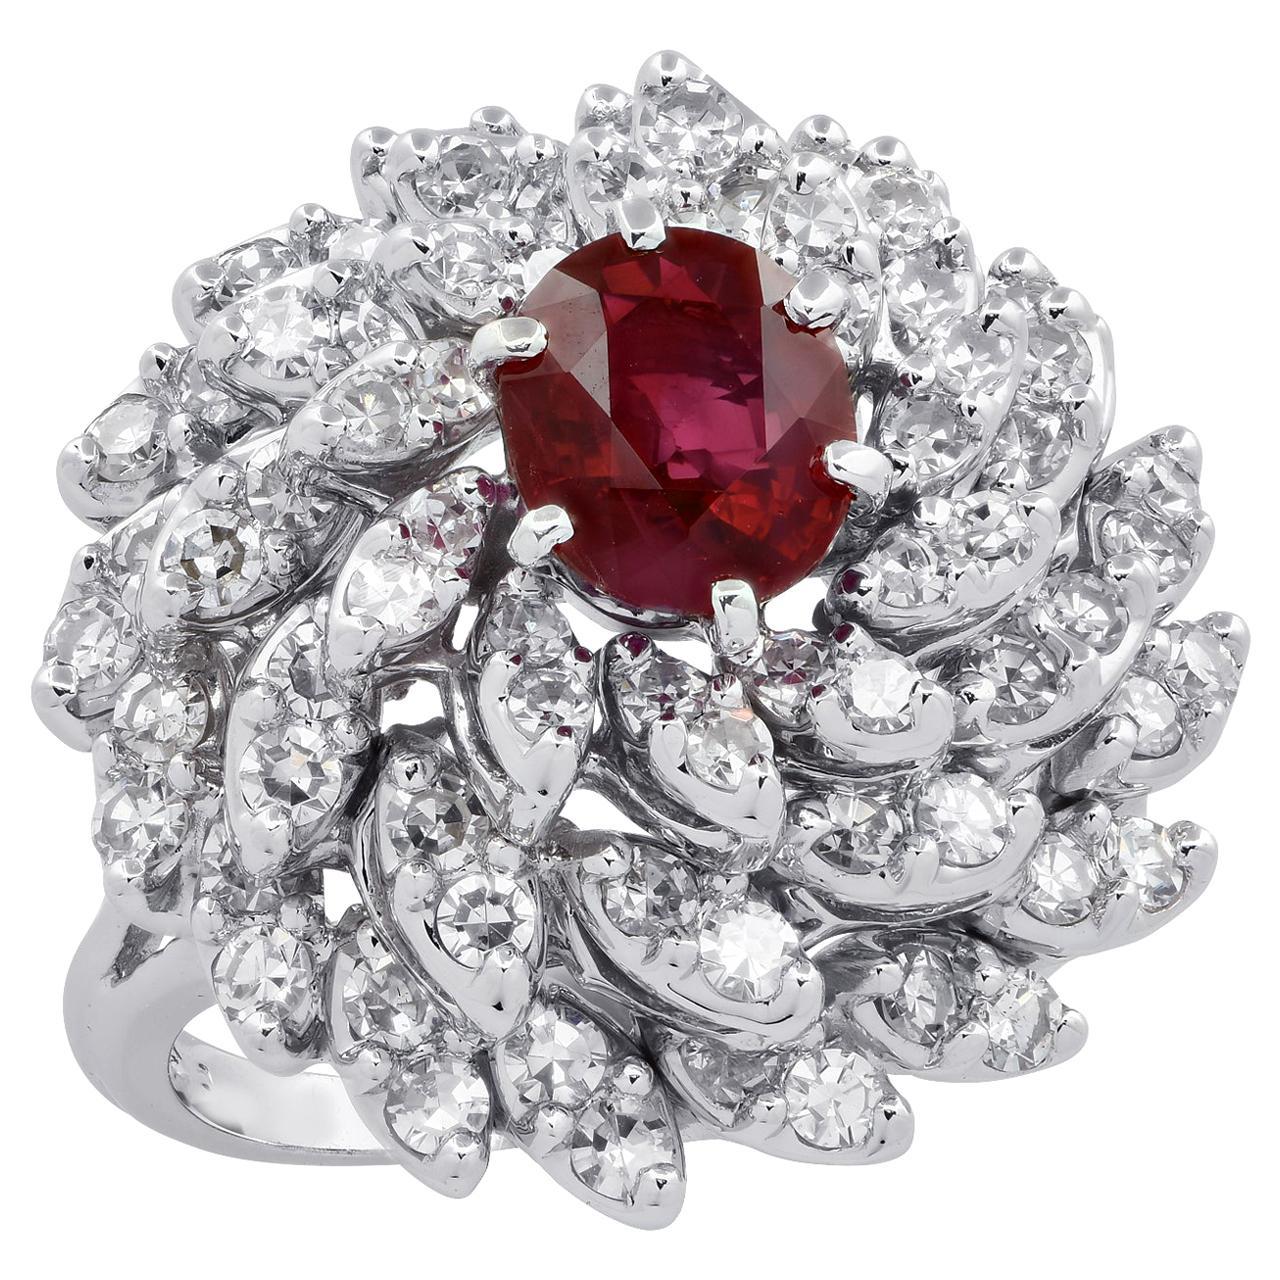 GIA Certified 1.31 Carat Ruby Cocktail Ring